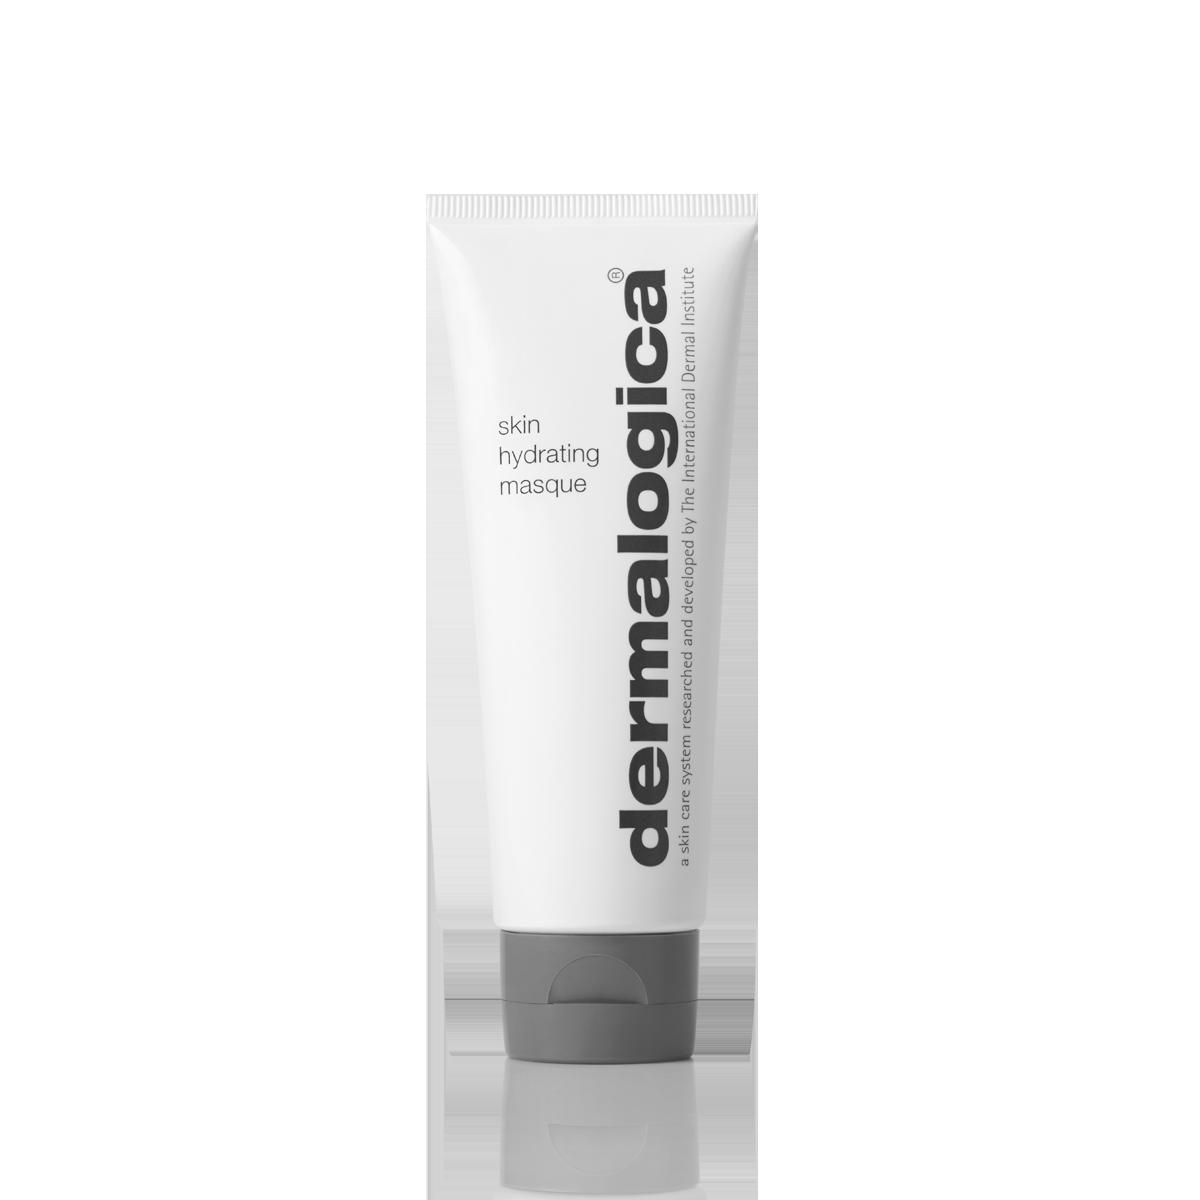 Skin Hydrating Masque - 75ml-1